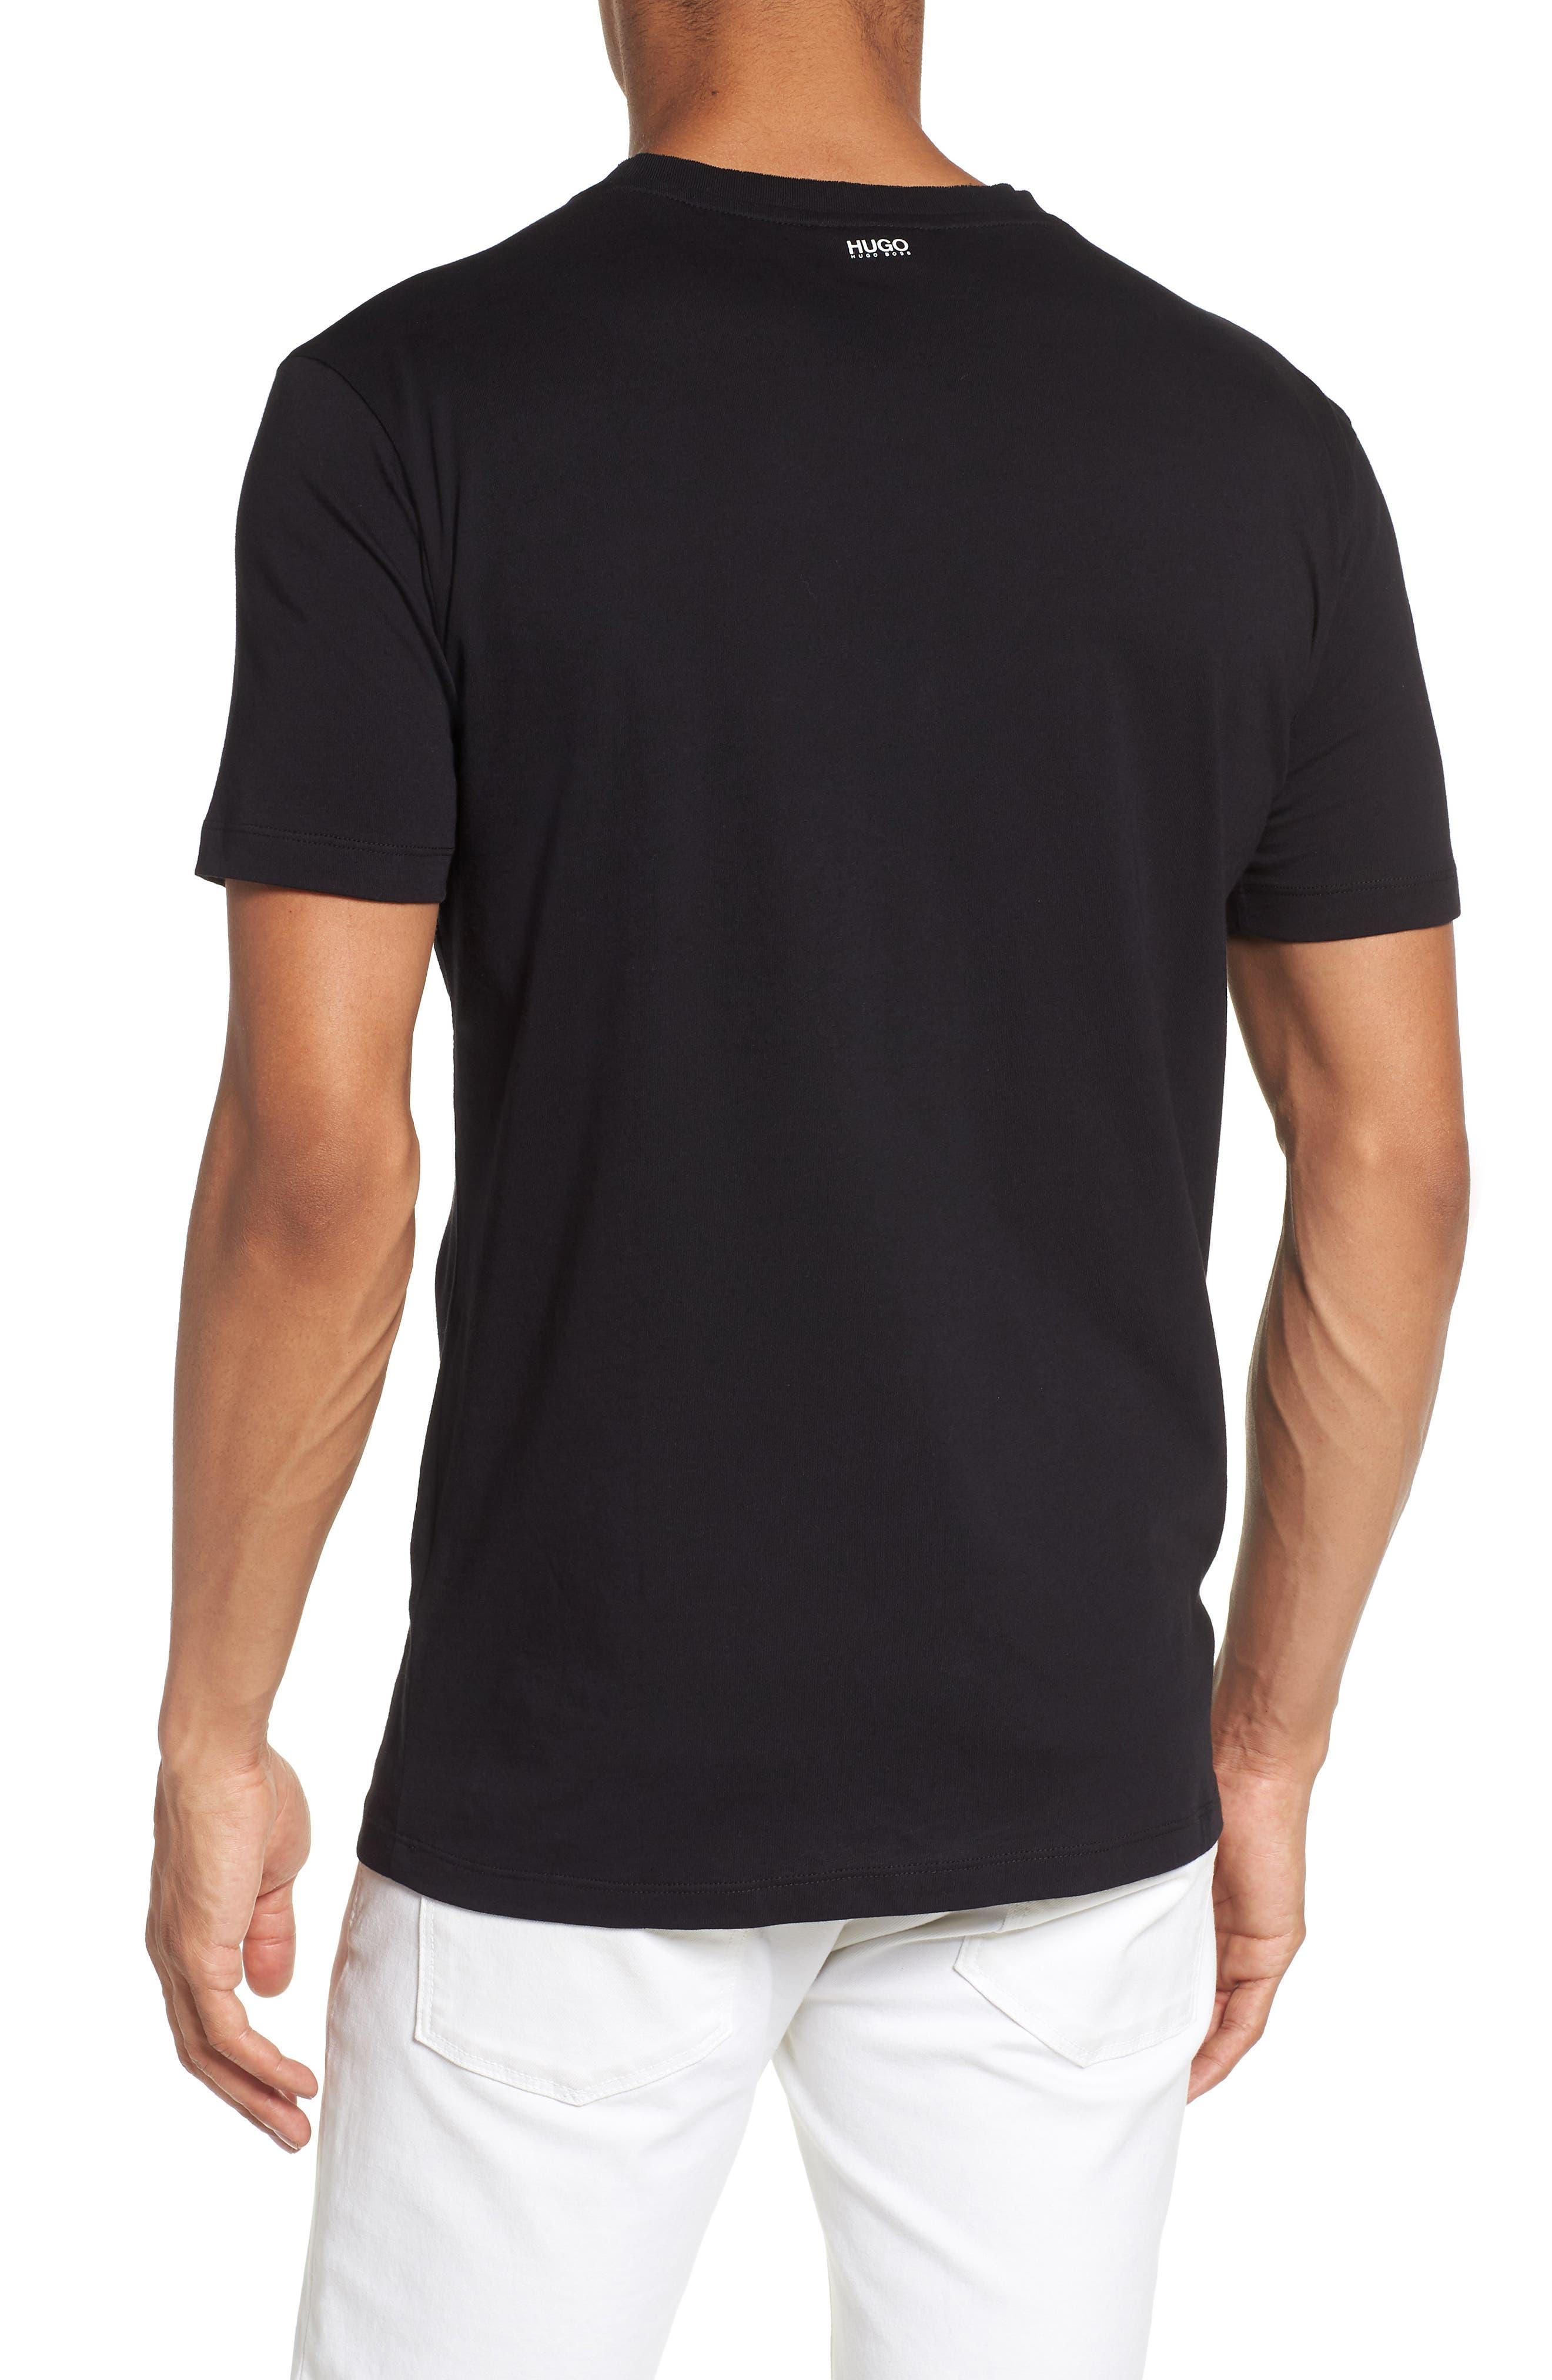 Dimage T-Shirt,                             Alternate thumbnail 2, color,                             Black